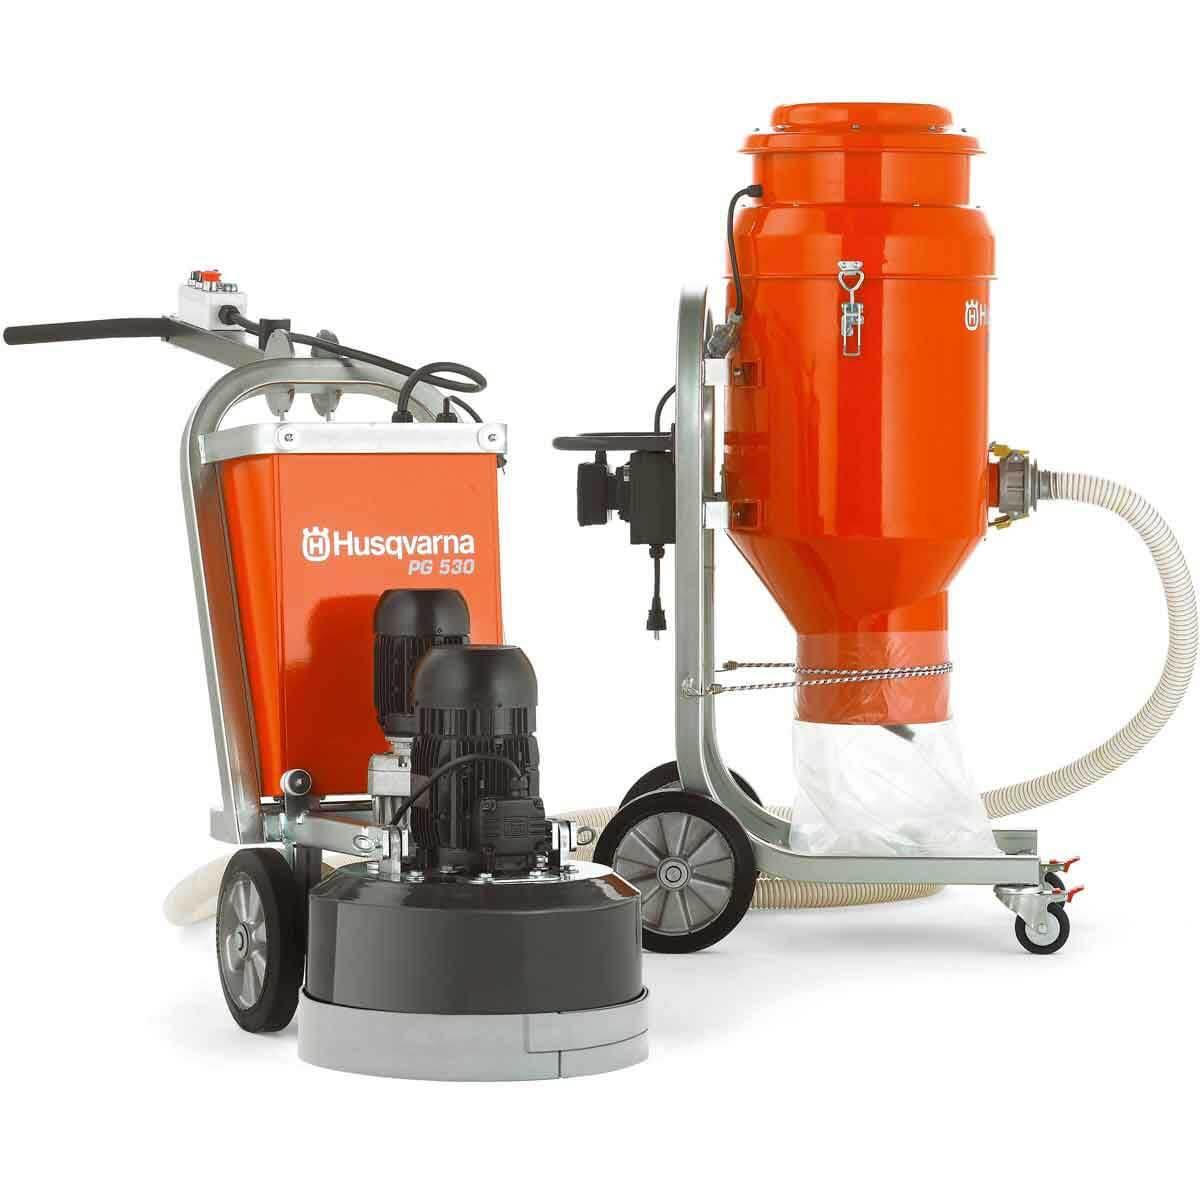 Husqvarna DC3300 Vacuum with PG530 Grinder